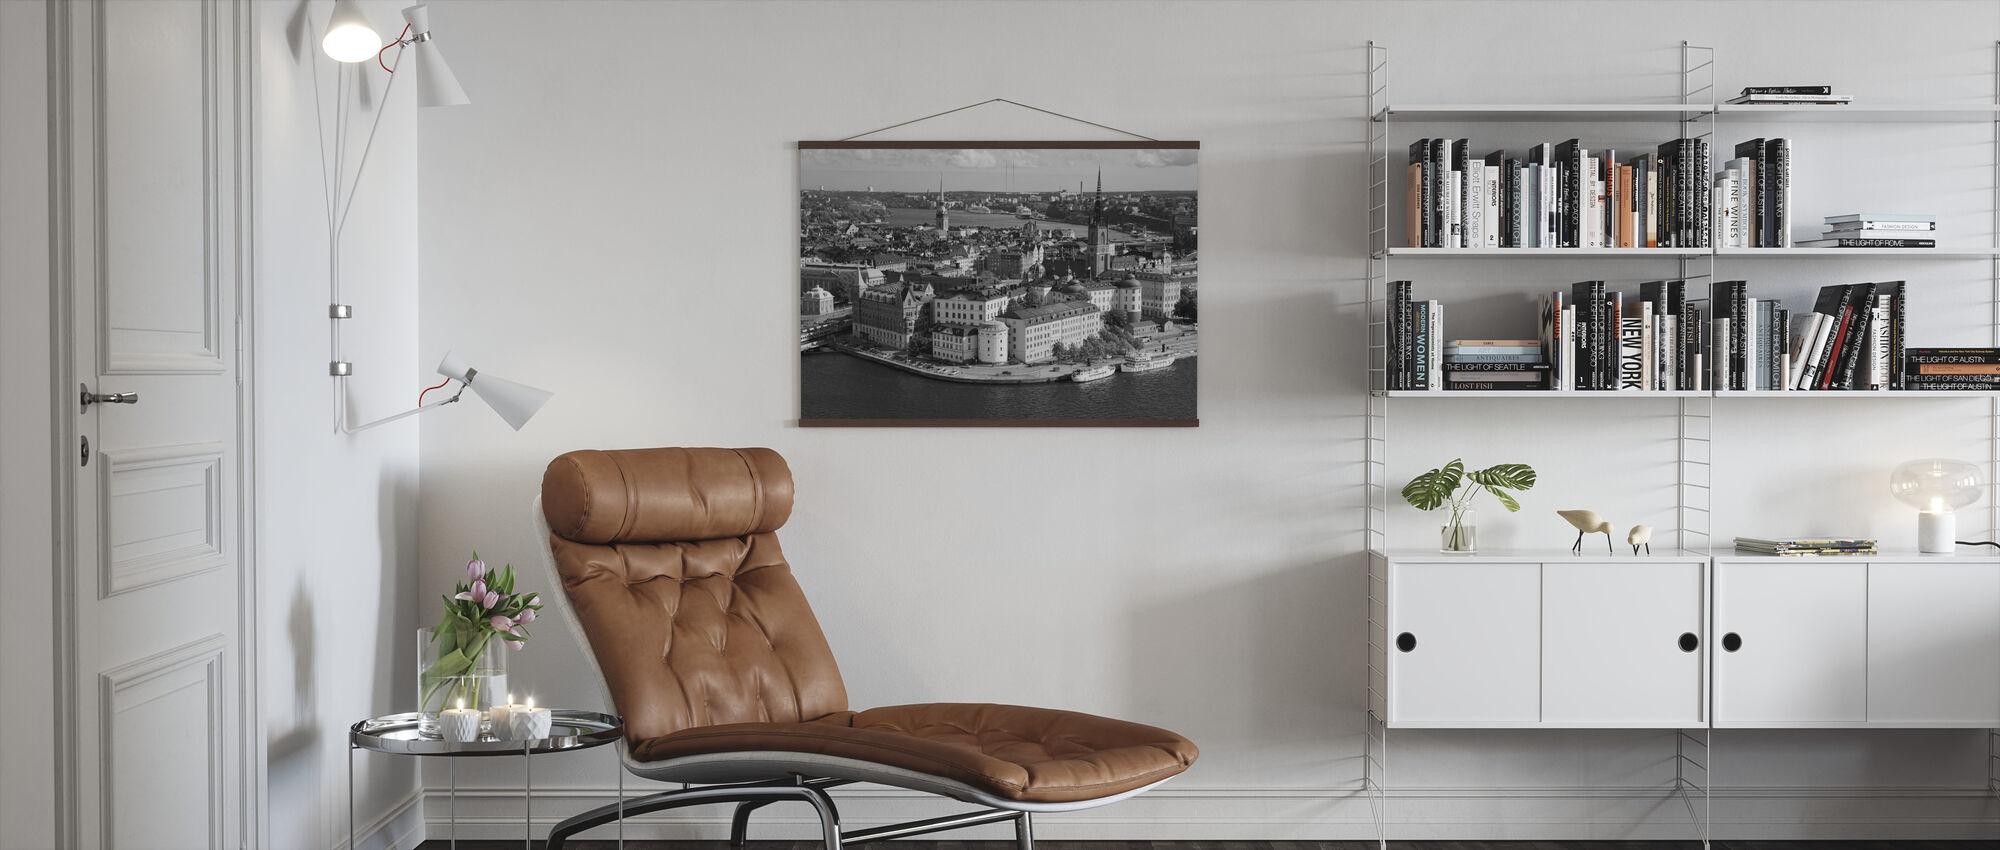 Stoccolma in luce - Poster - Salotto